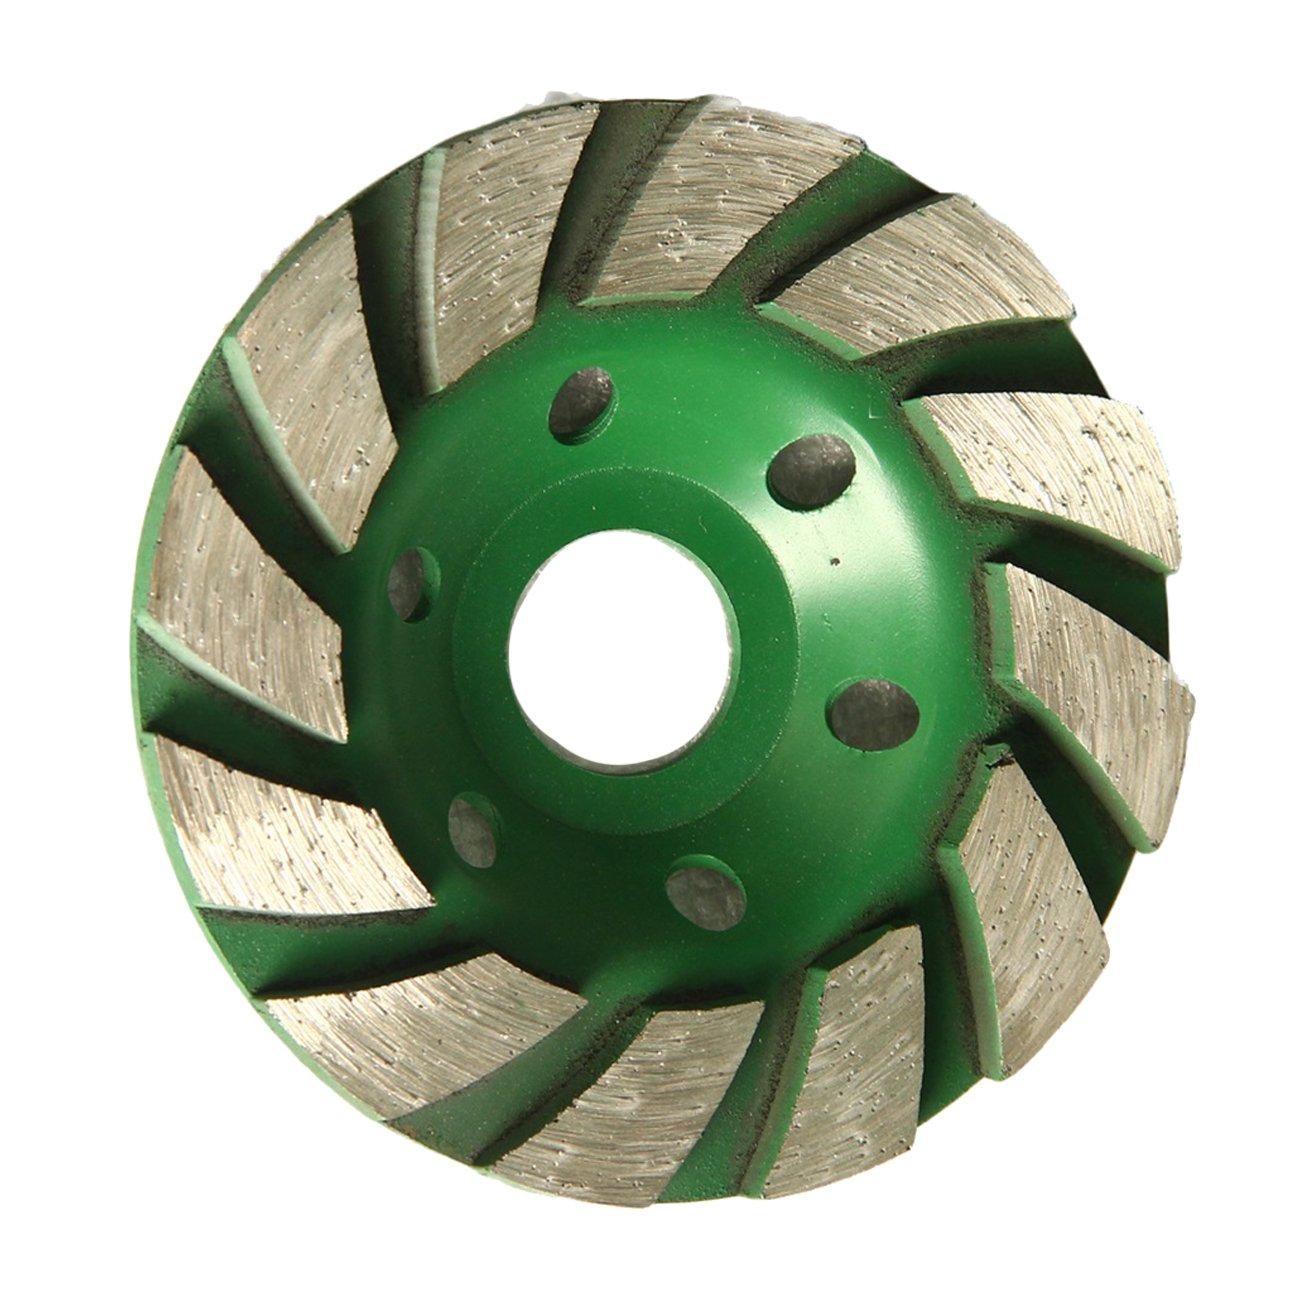 Raomdityat 1pc Concrete Turbo Diamond Grinding Wheel for Angle Grinder